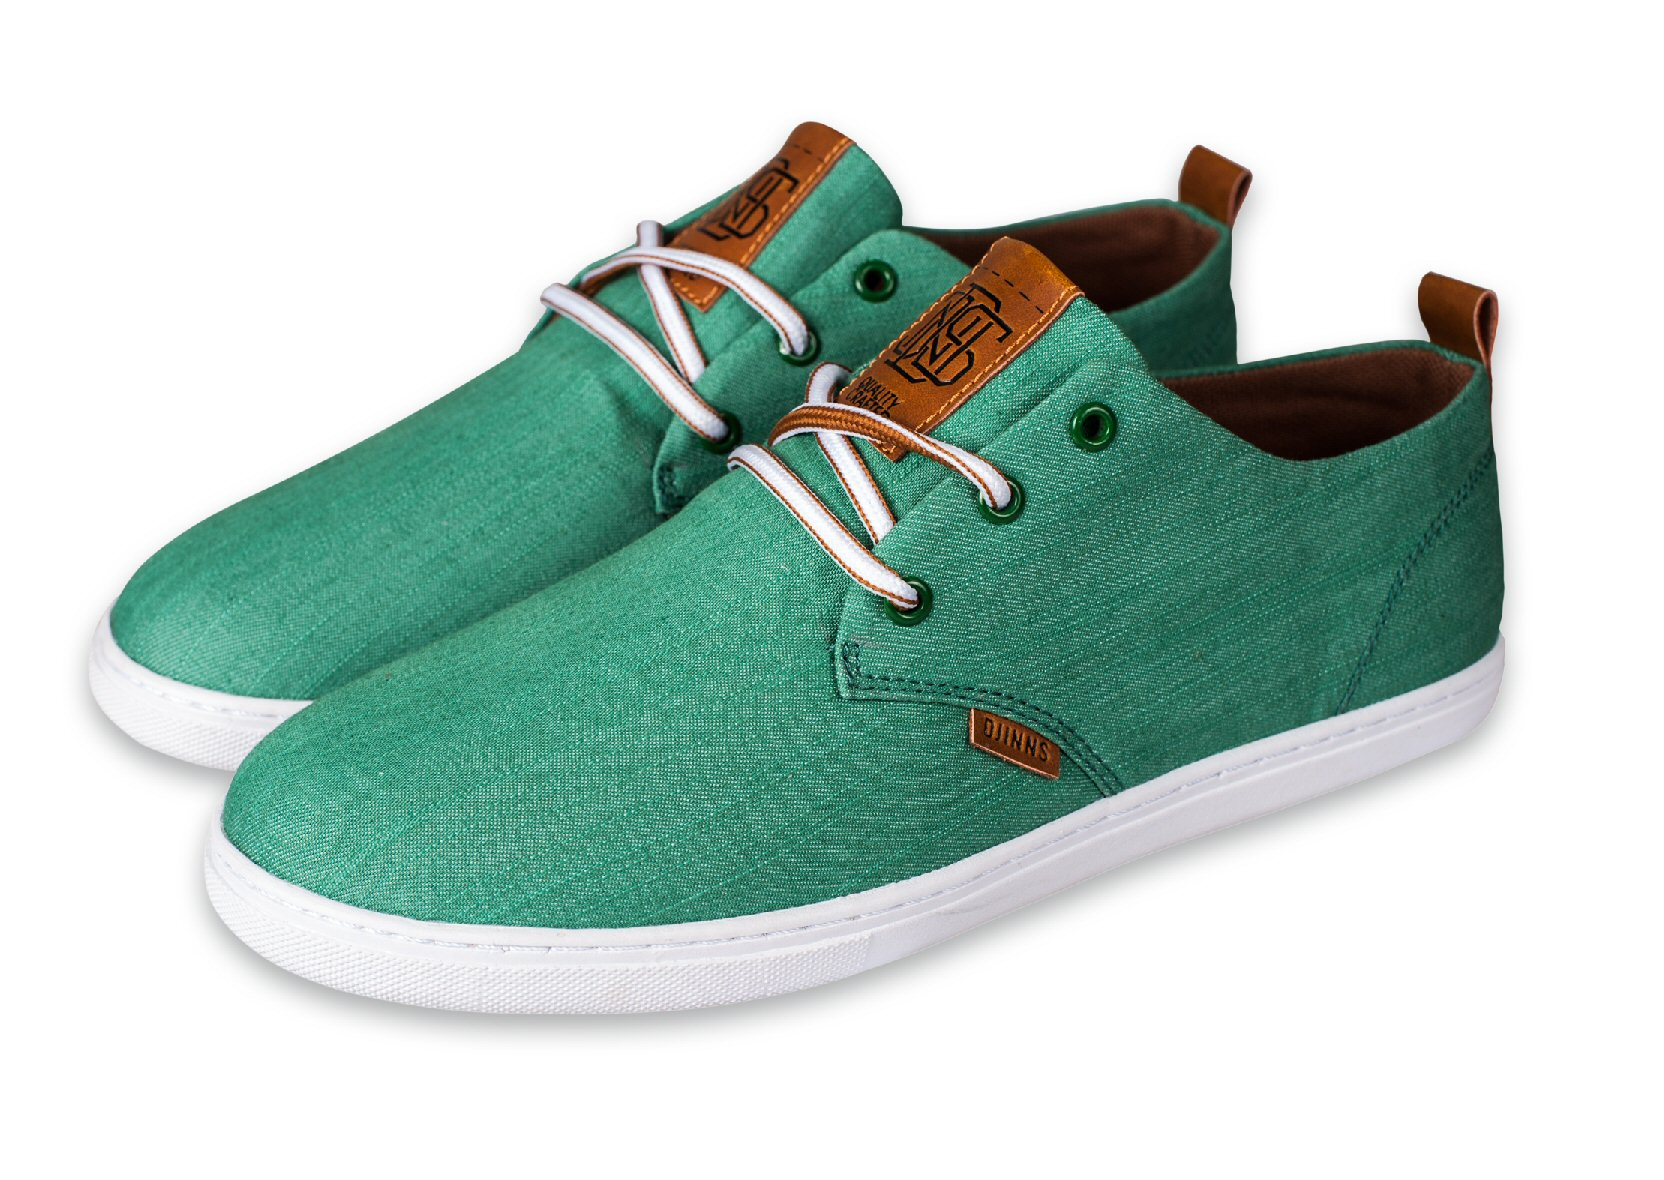 Djinn´s Djinns Low Lau Linen 2014 grün Sneaker Herren